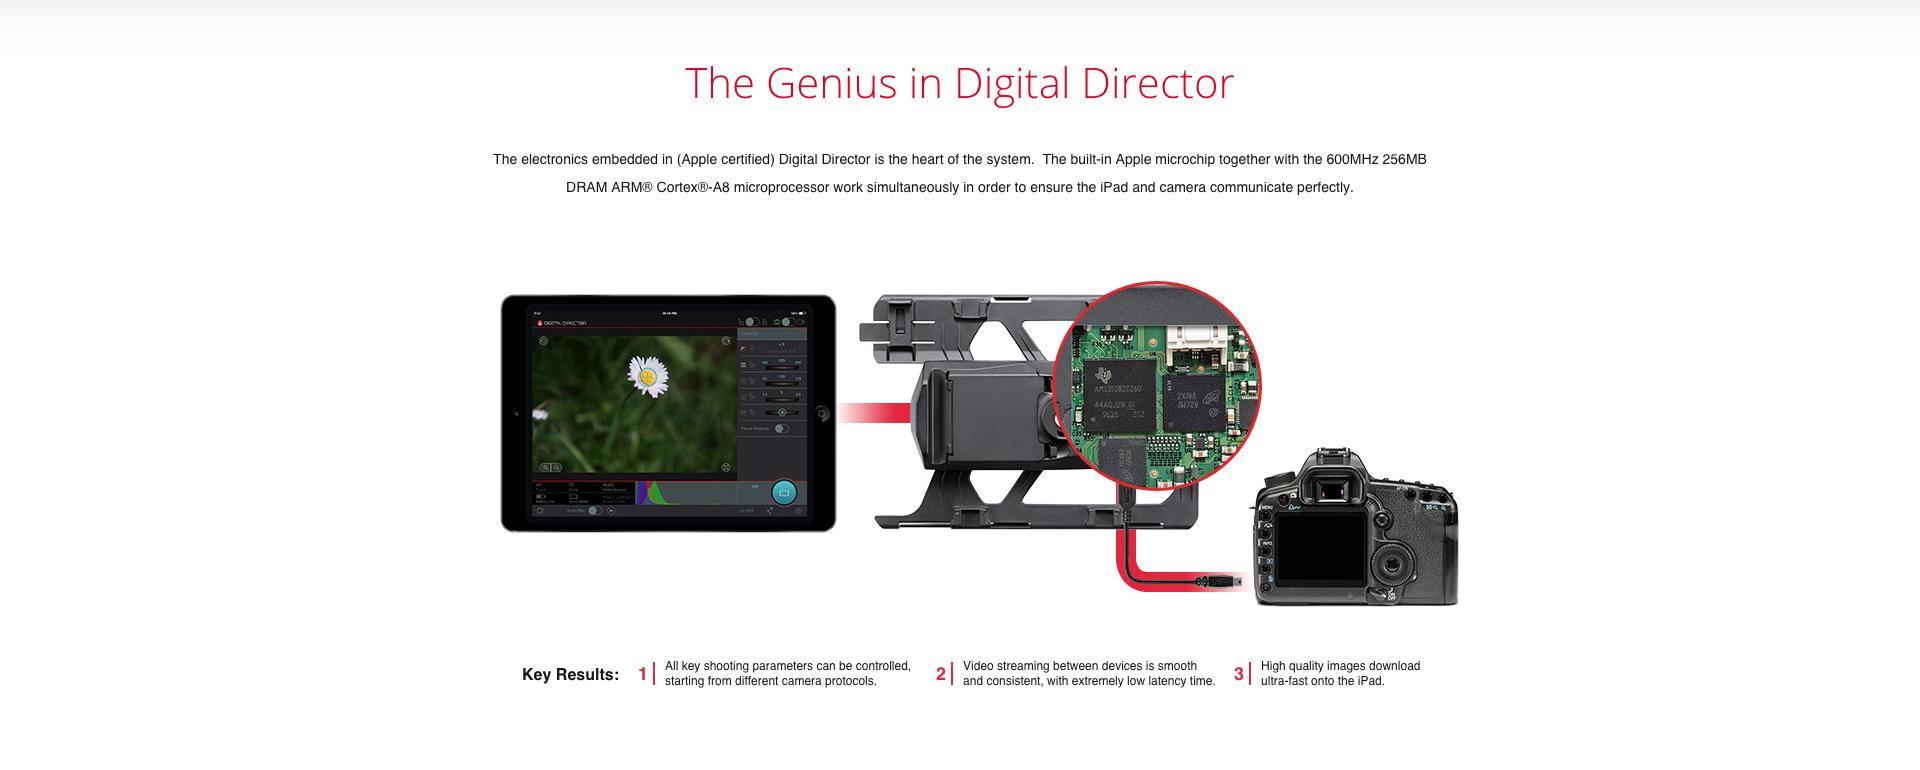 The Genius in Digital Director